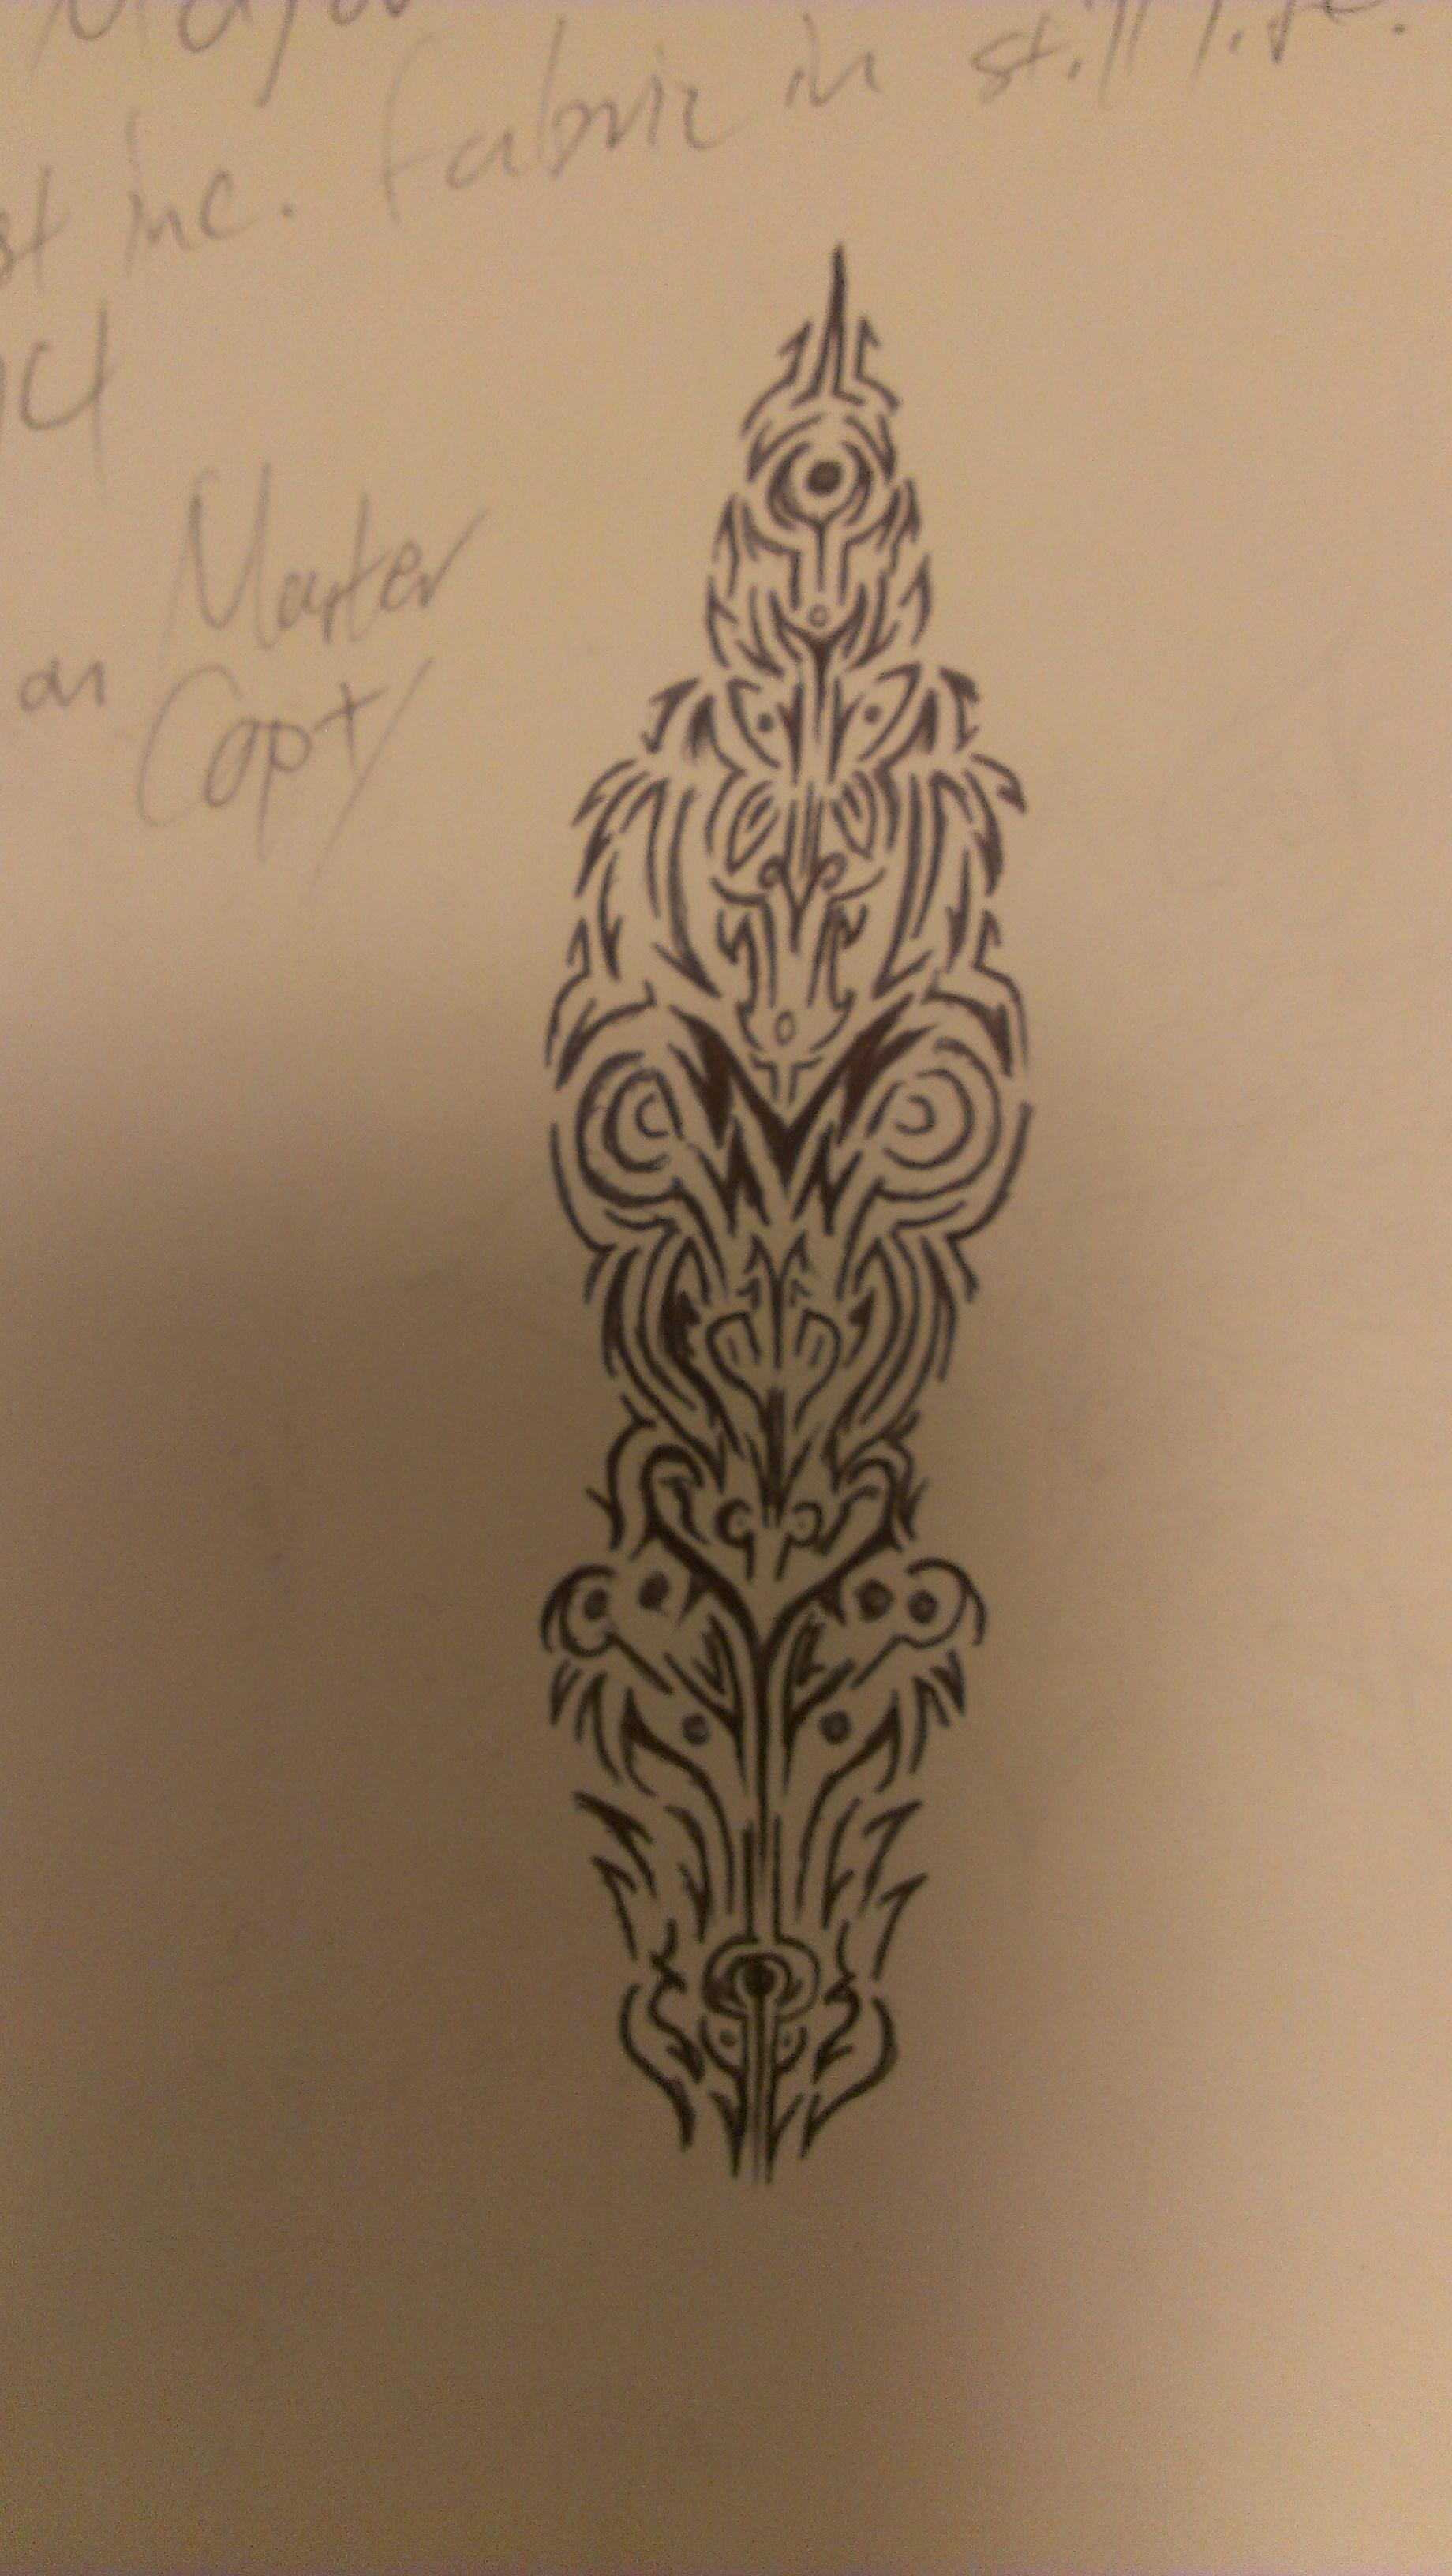 linear tattoo design by kitsunevessel on deviantart. Black Bedroom Furniture Sets. Home Design Ideas